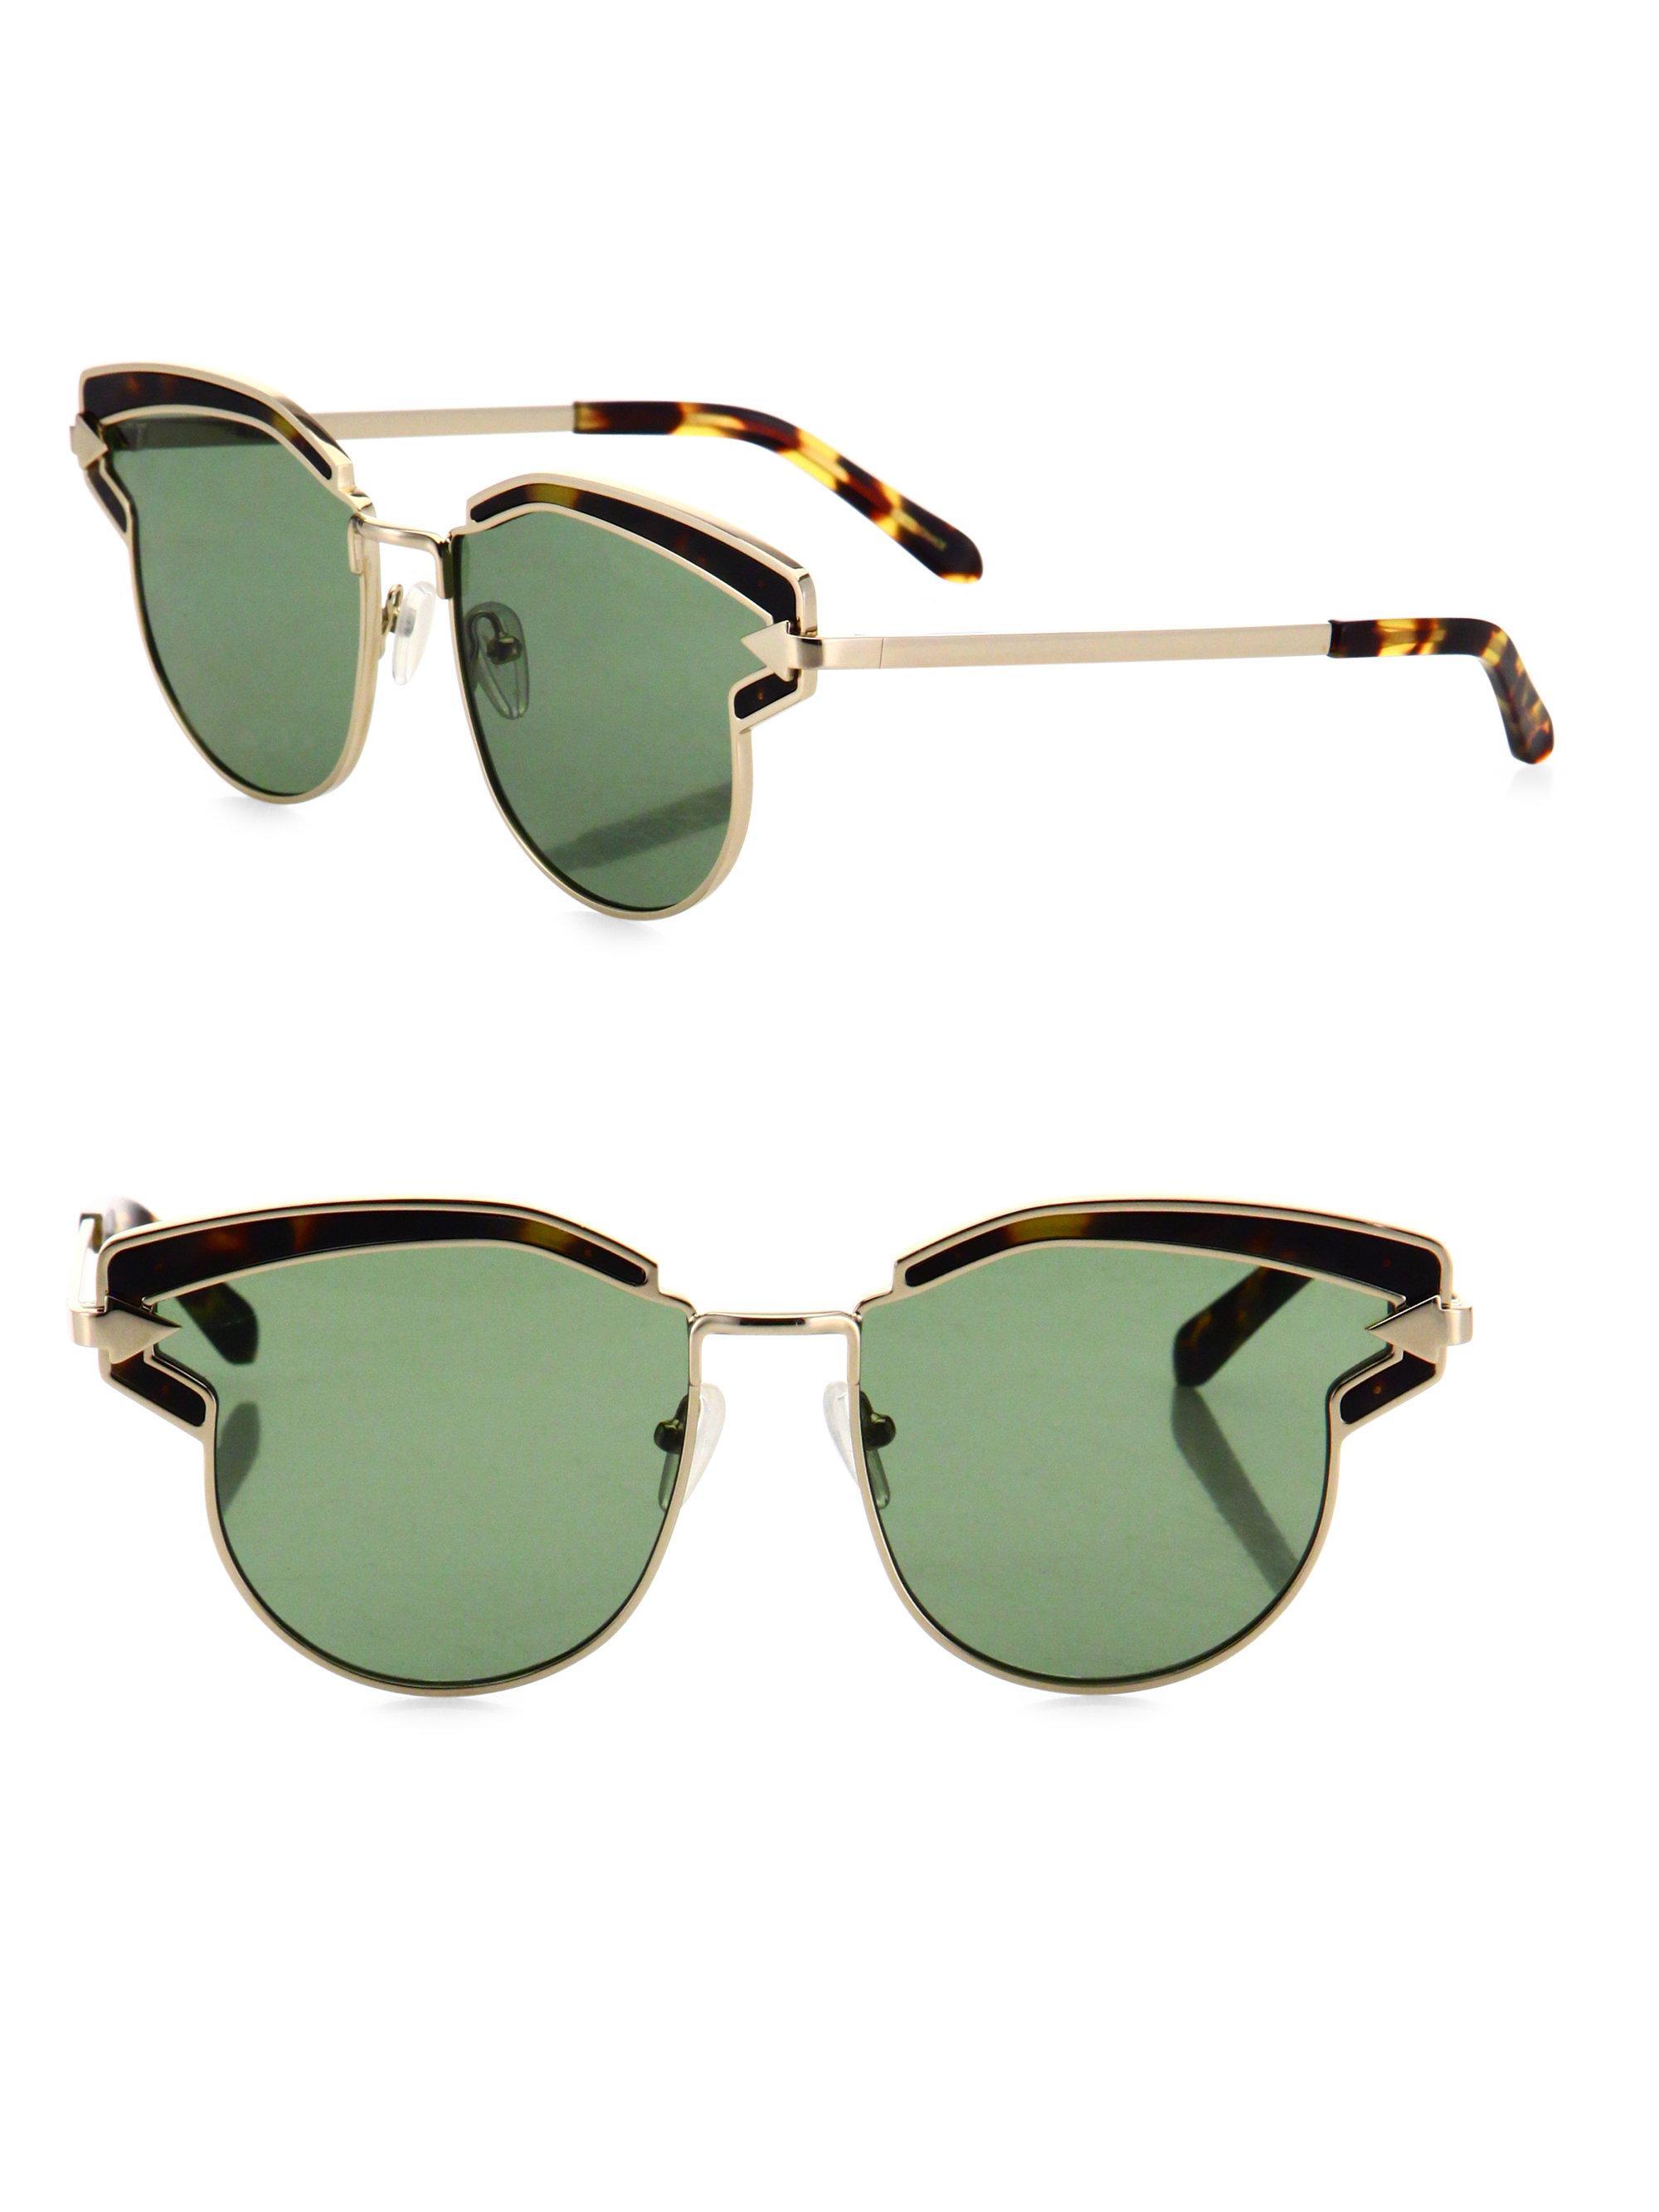 e6439de1d3b0 Lyst - Karen Walker Felipe 57mm Round Sunglasses in Metallic